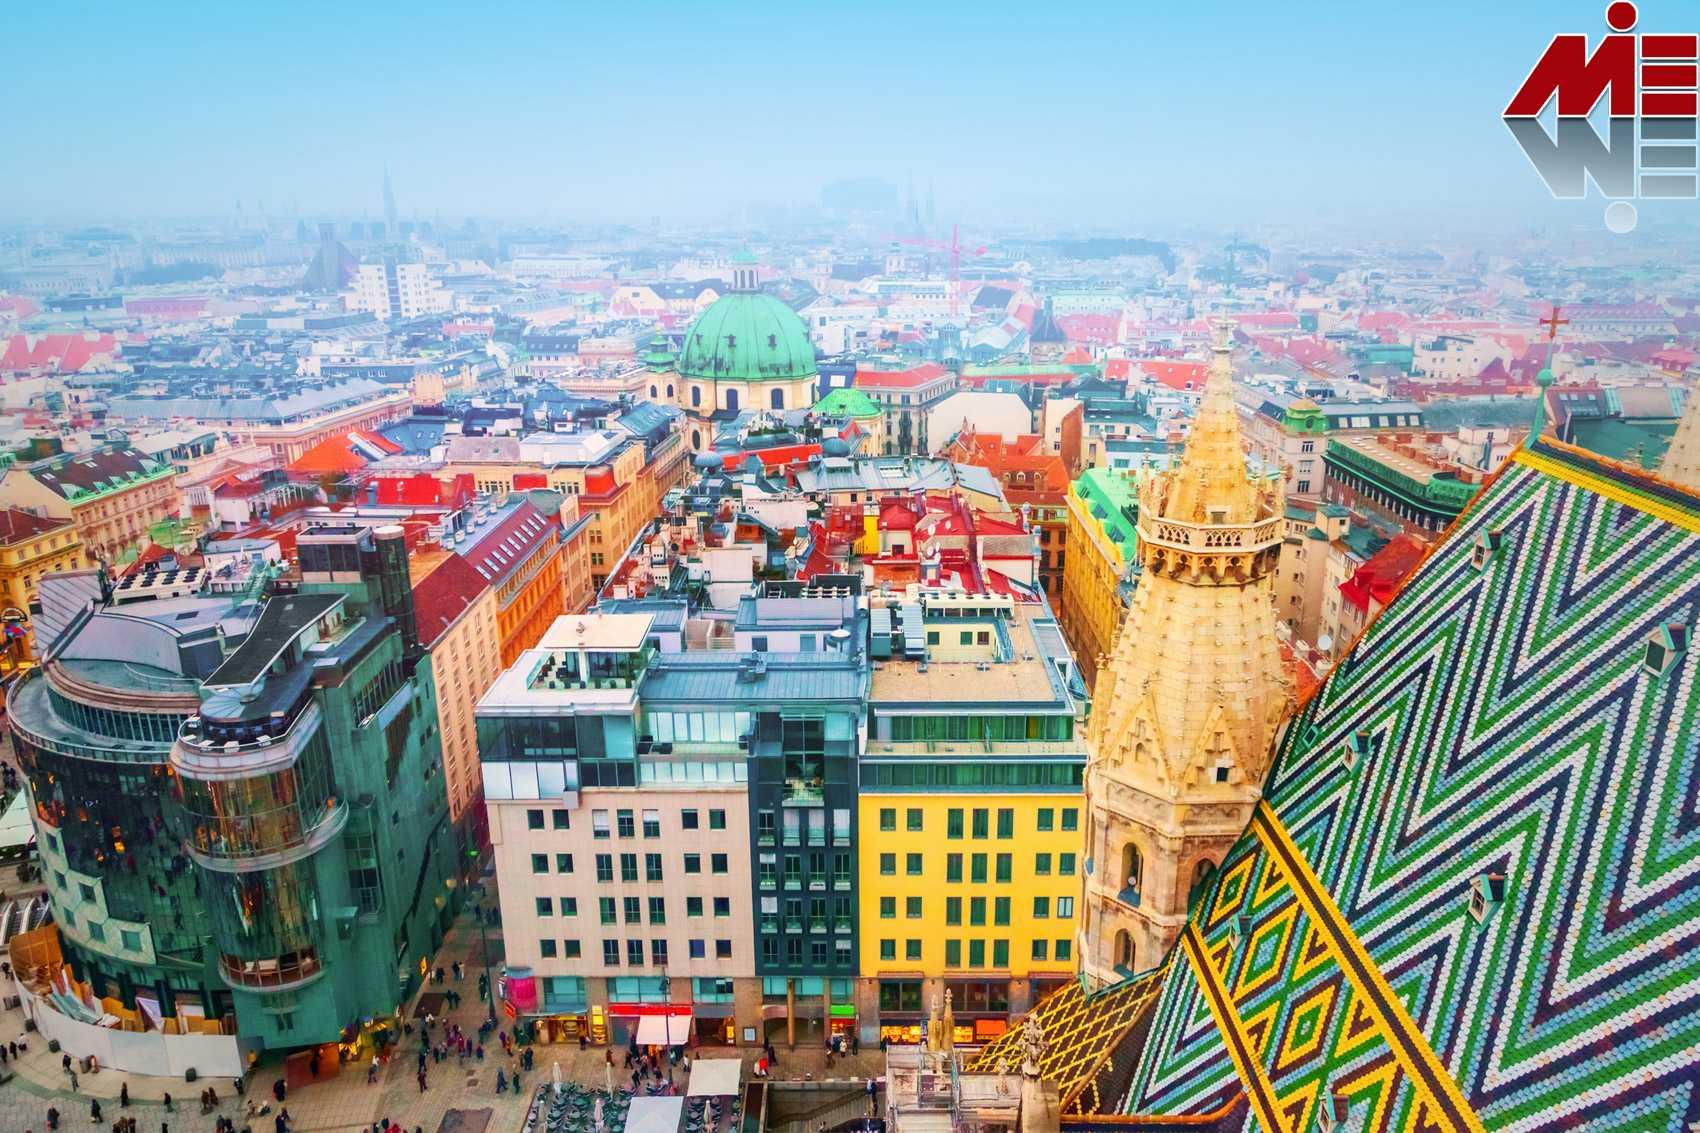 5855263381a45e3dde550bf31a058d8516db0229 work abroad austria 1 روش های مهاجرت به اتریش